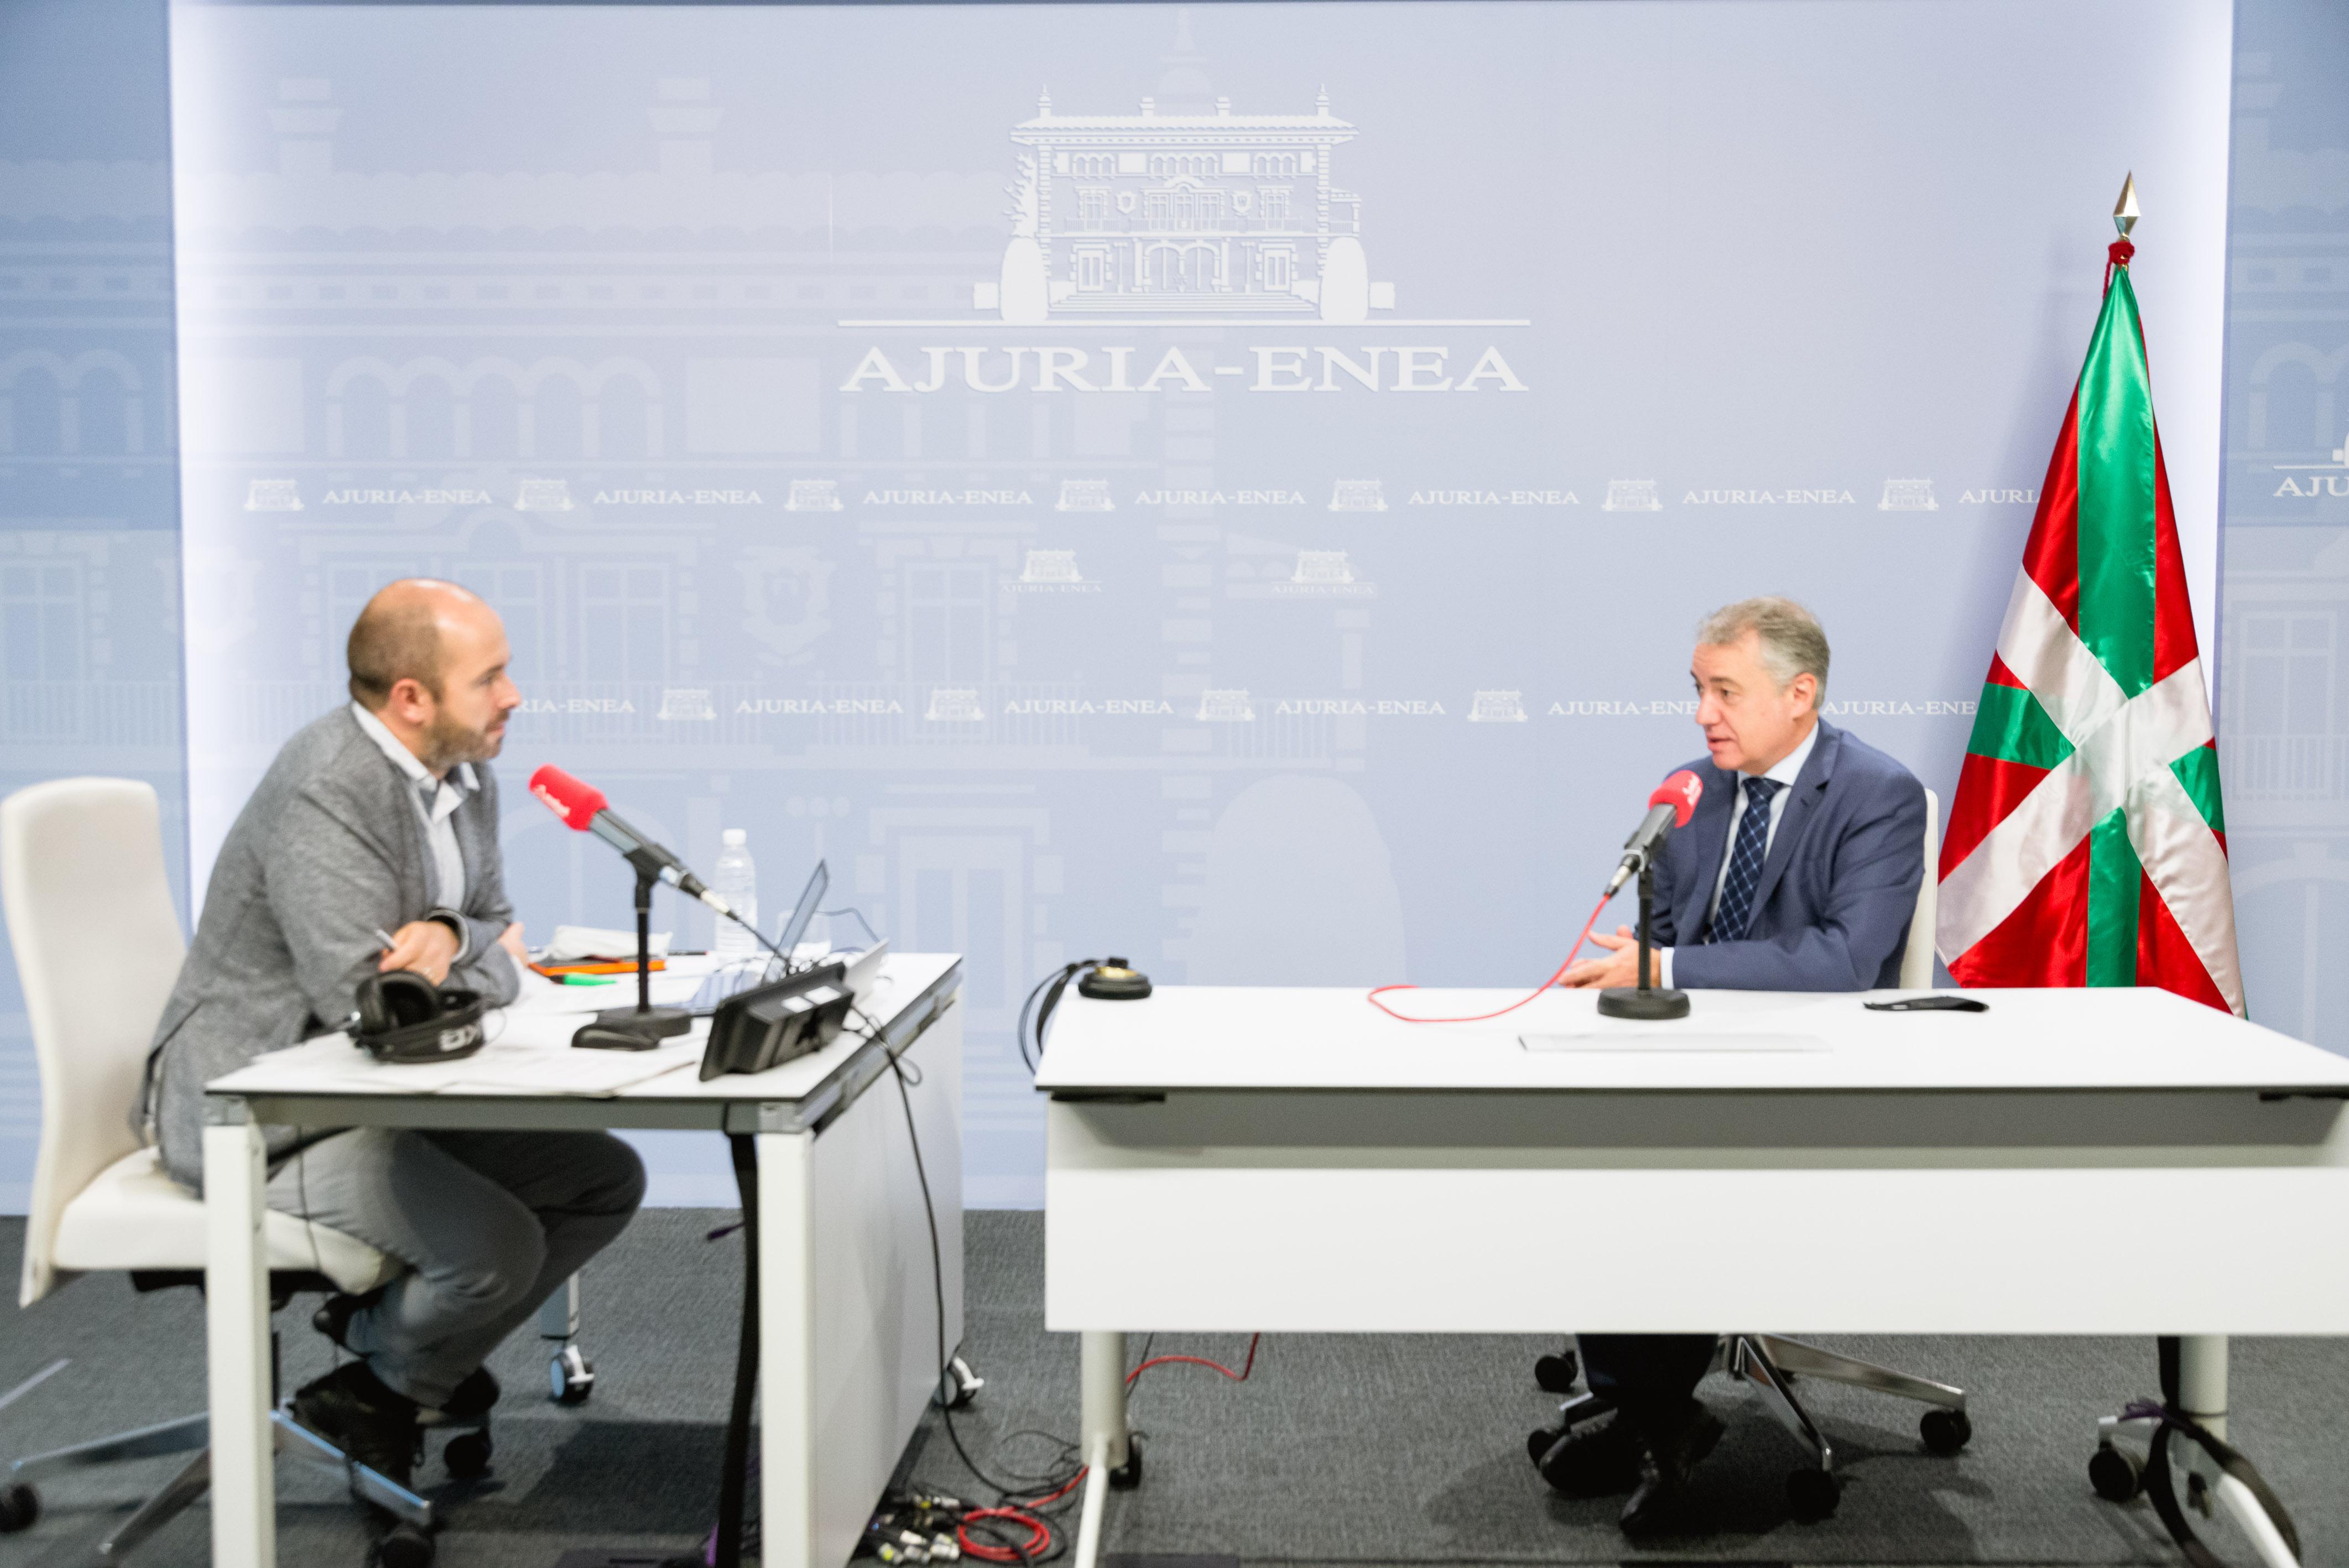 entrevista_radioeuskadi_vitoria_30-9-2020_usual-3060.jpg